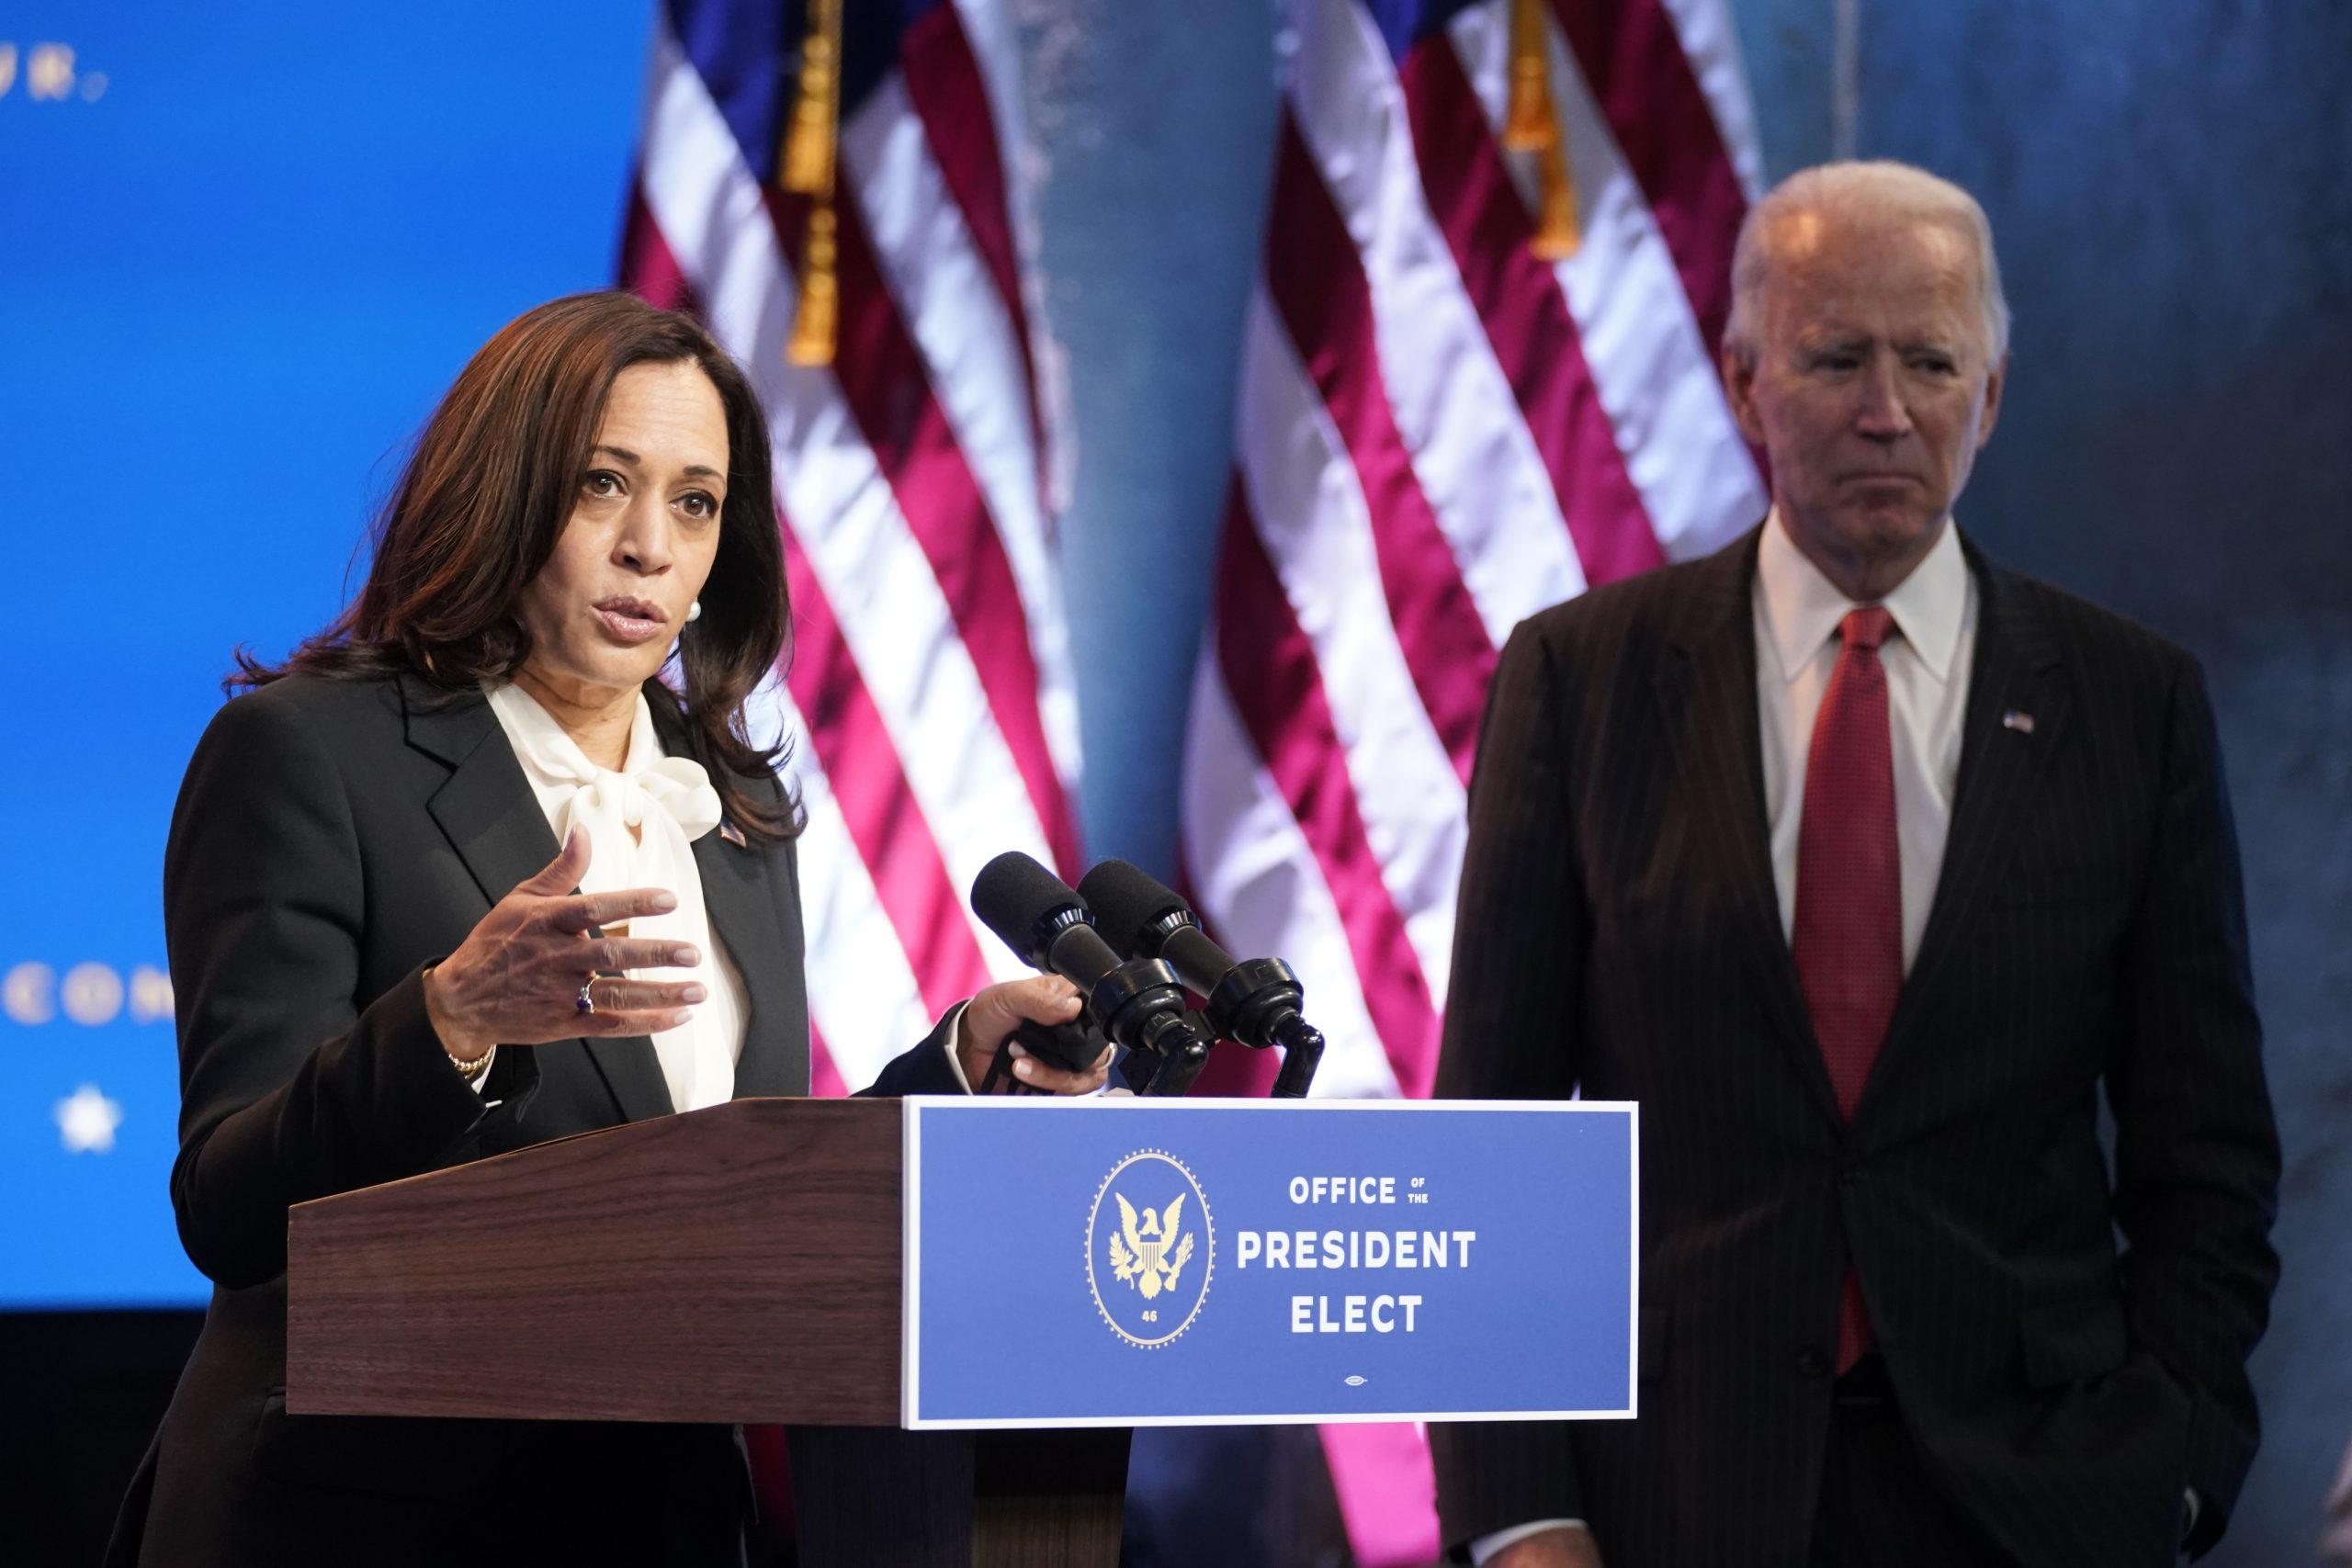 Kamala Harris speaking at podium, with Joe Biden in the background